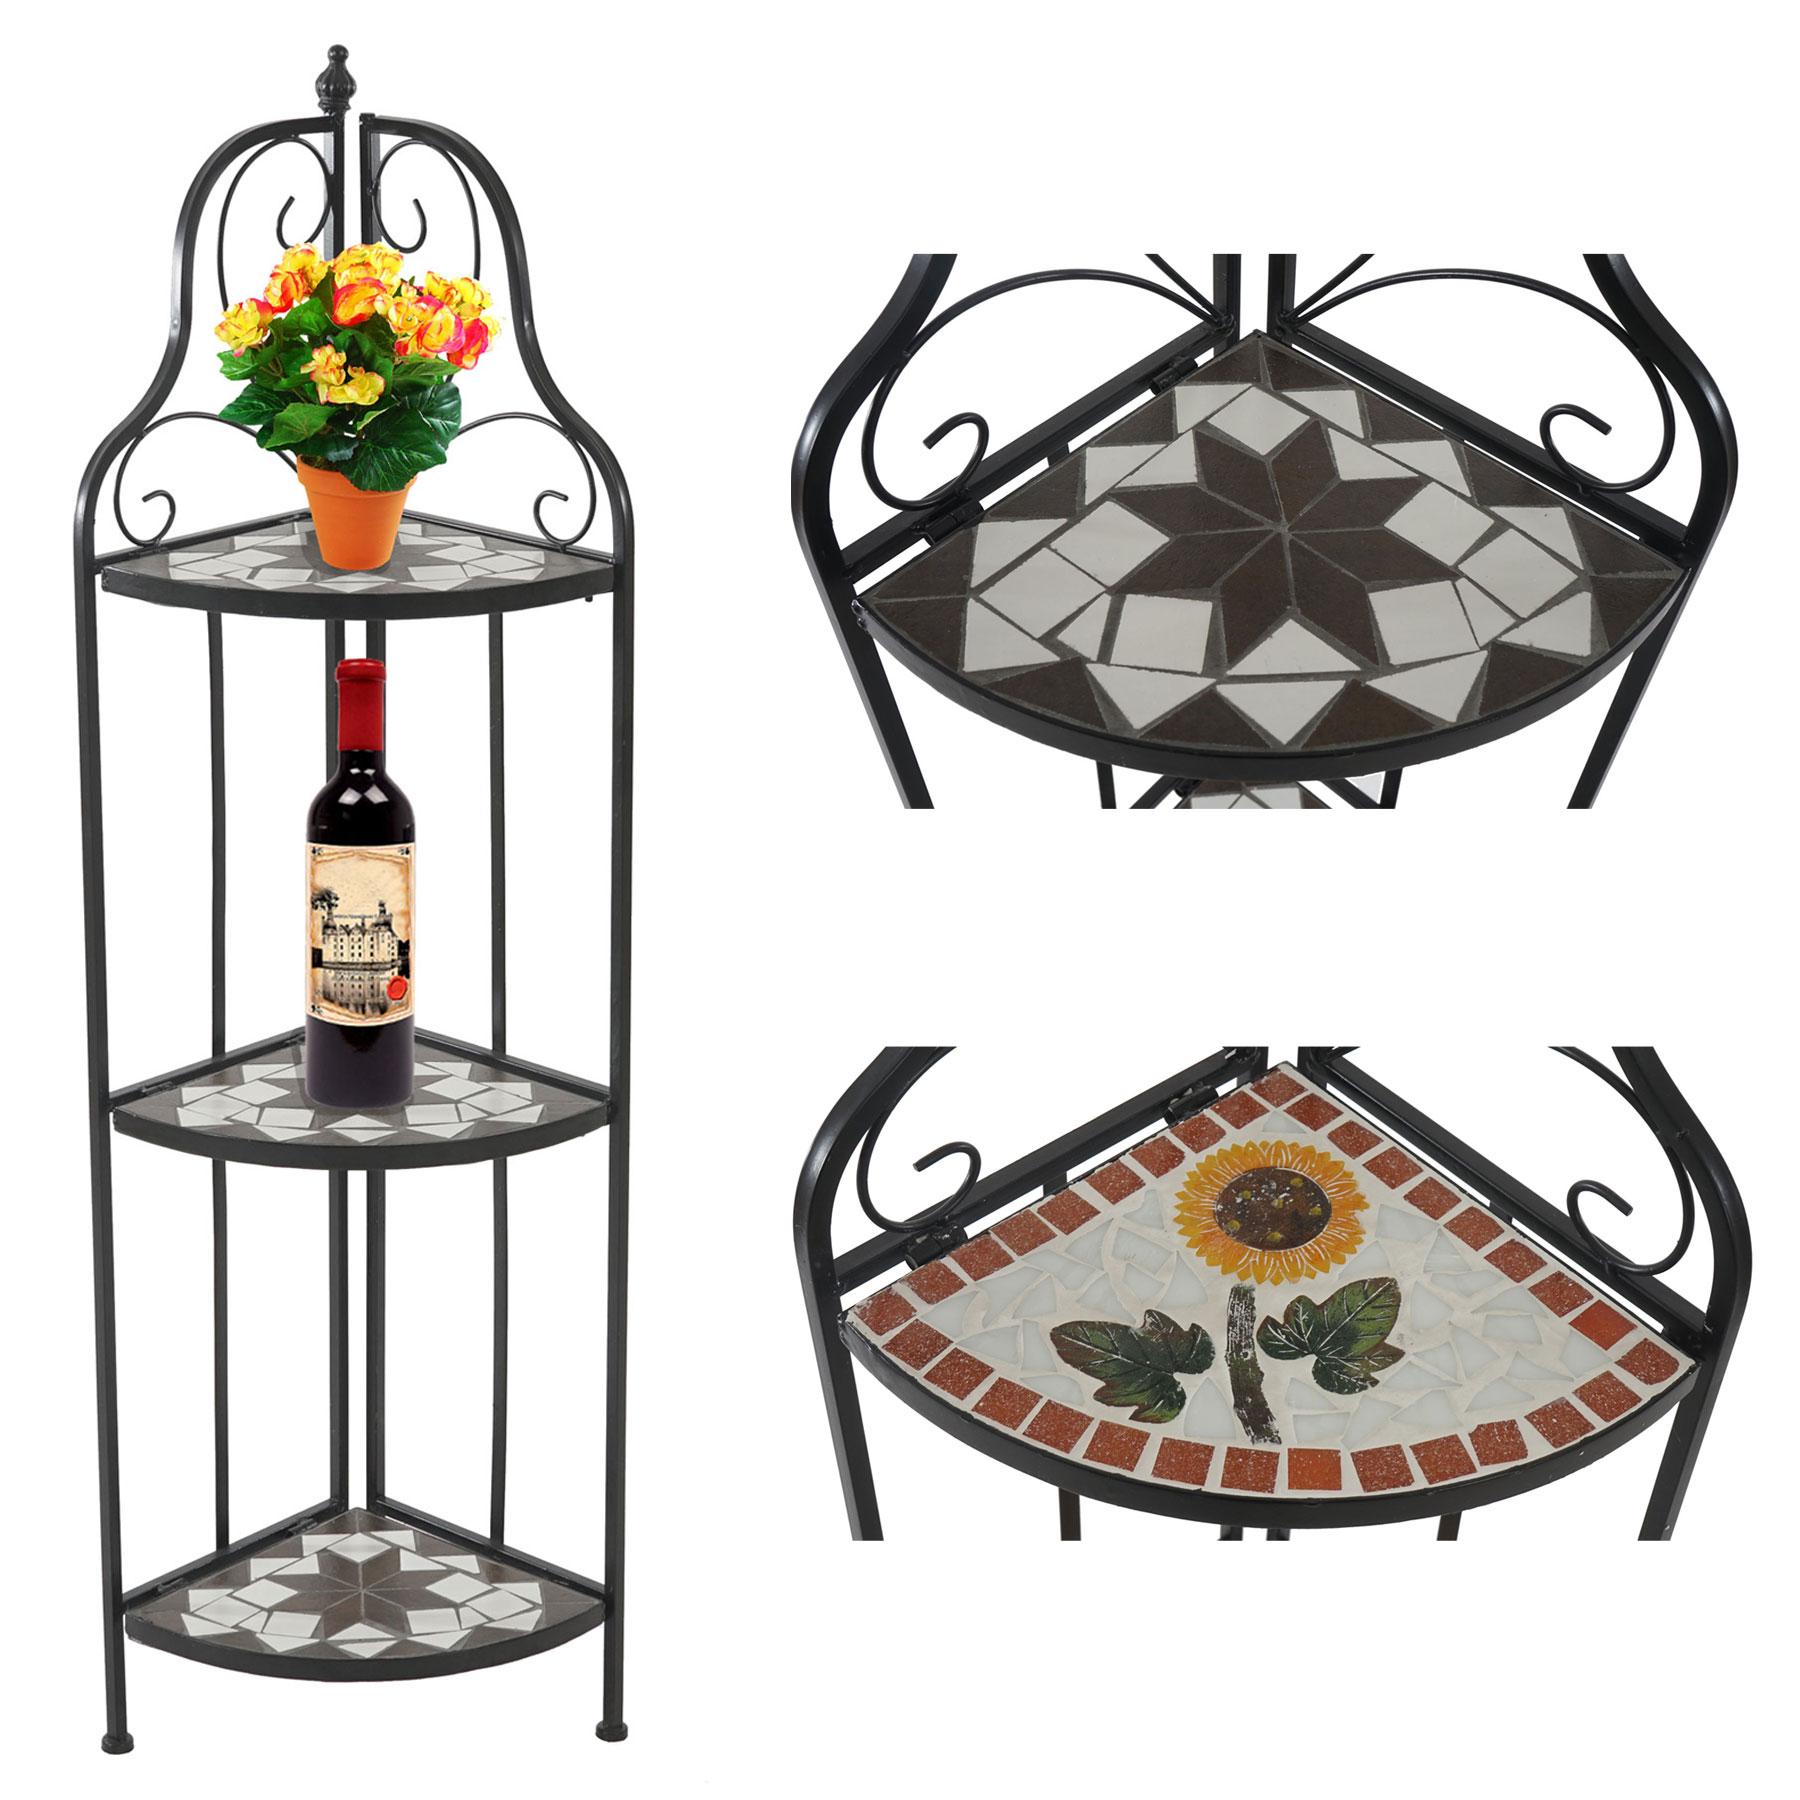 mosaik eckregal andria pflanzregal wandregal metallregal 3 b den. Black Bedroom Furniture Sets. Home Design Ideas